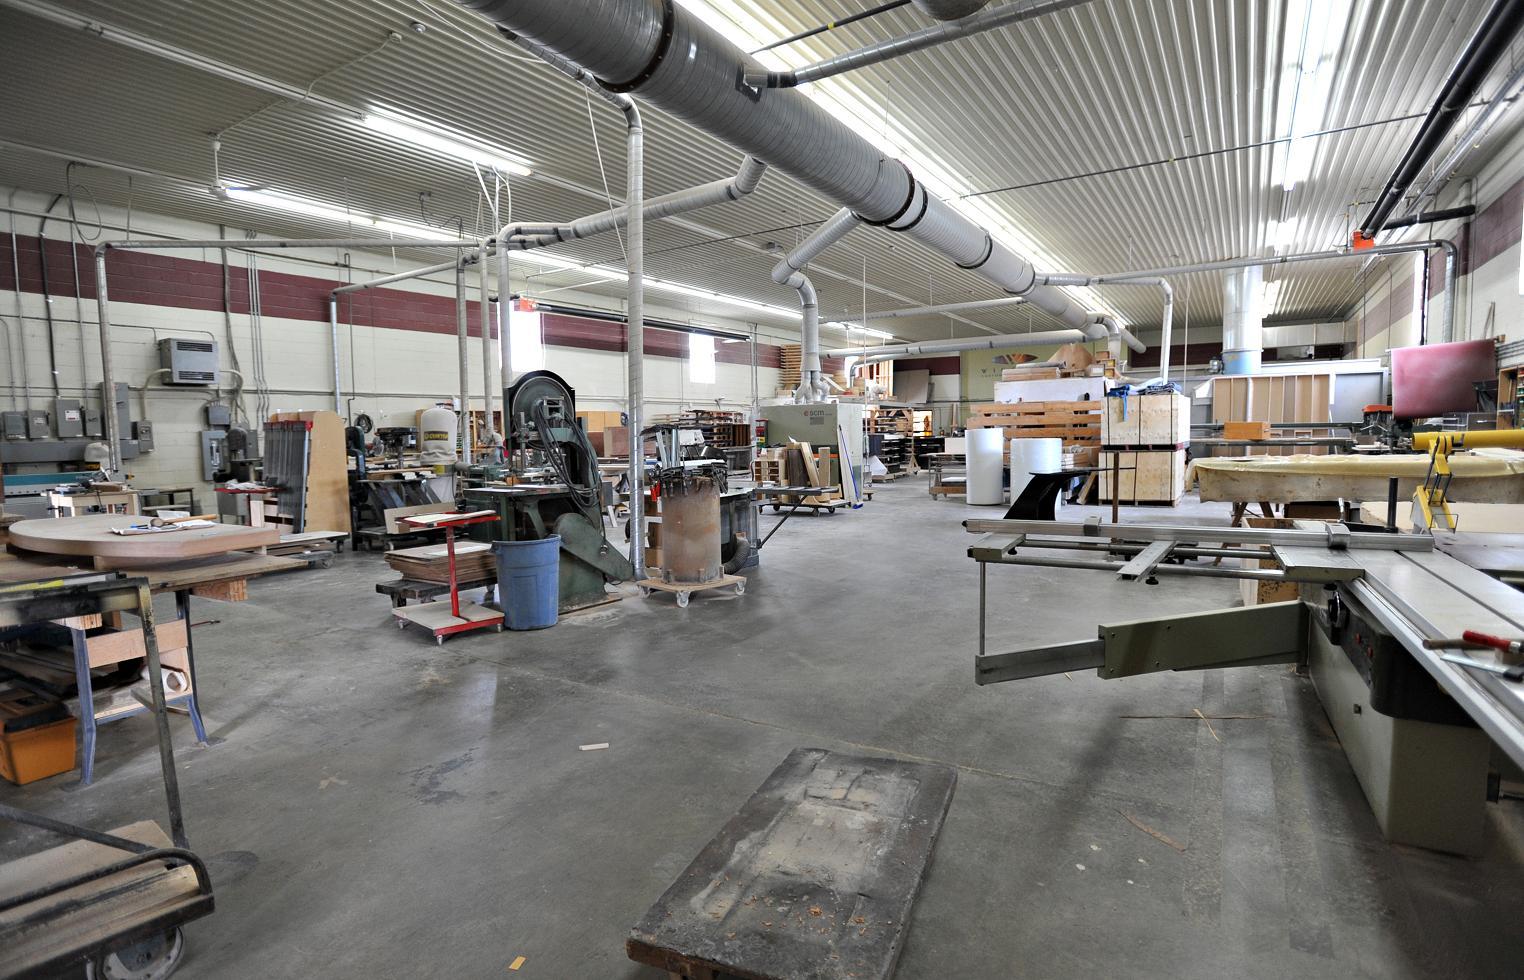 Musings of a Furniture Maker: Wiggers Custom Furniture Ltd. - Company History